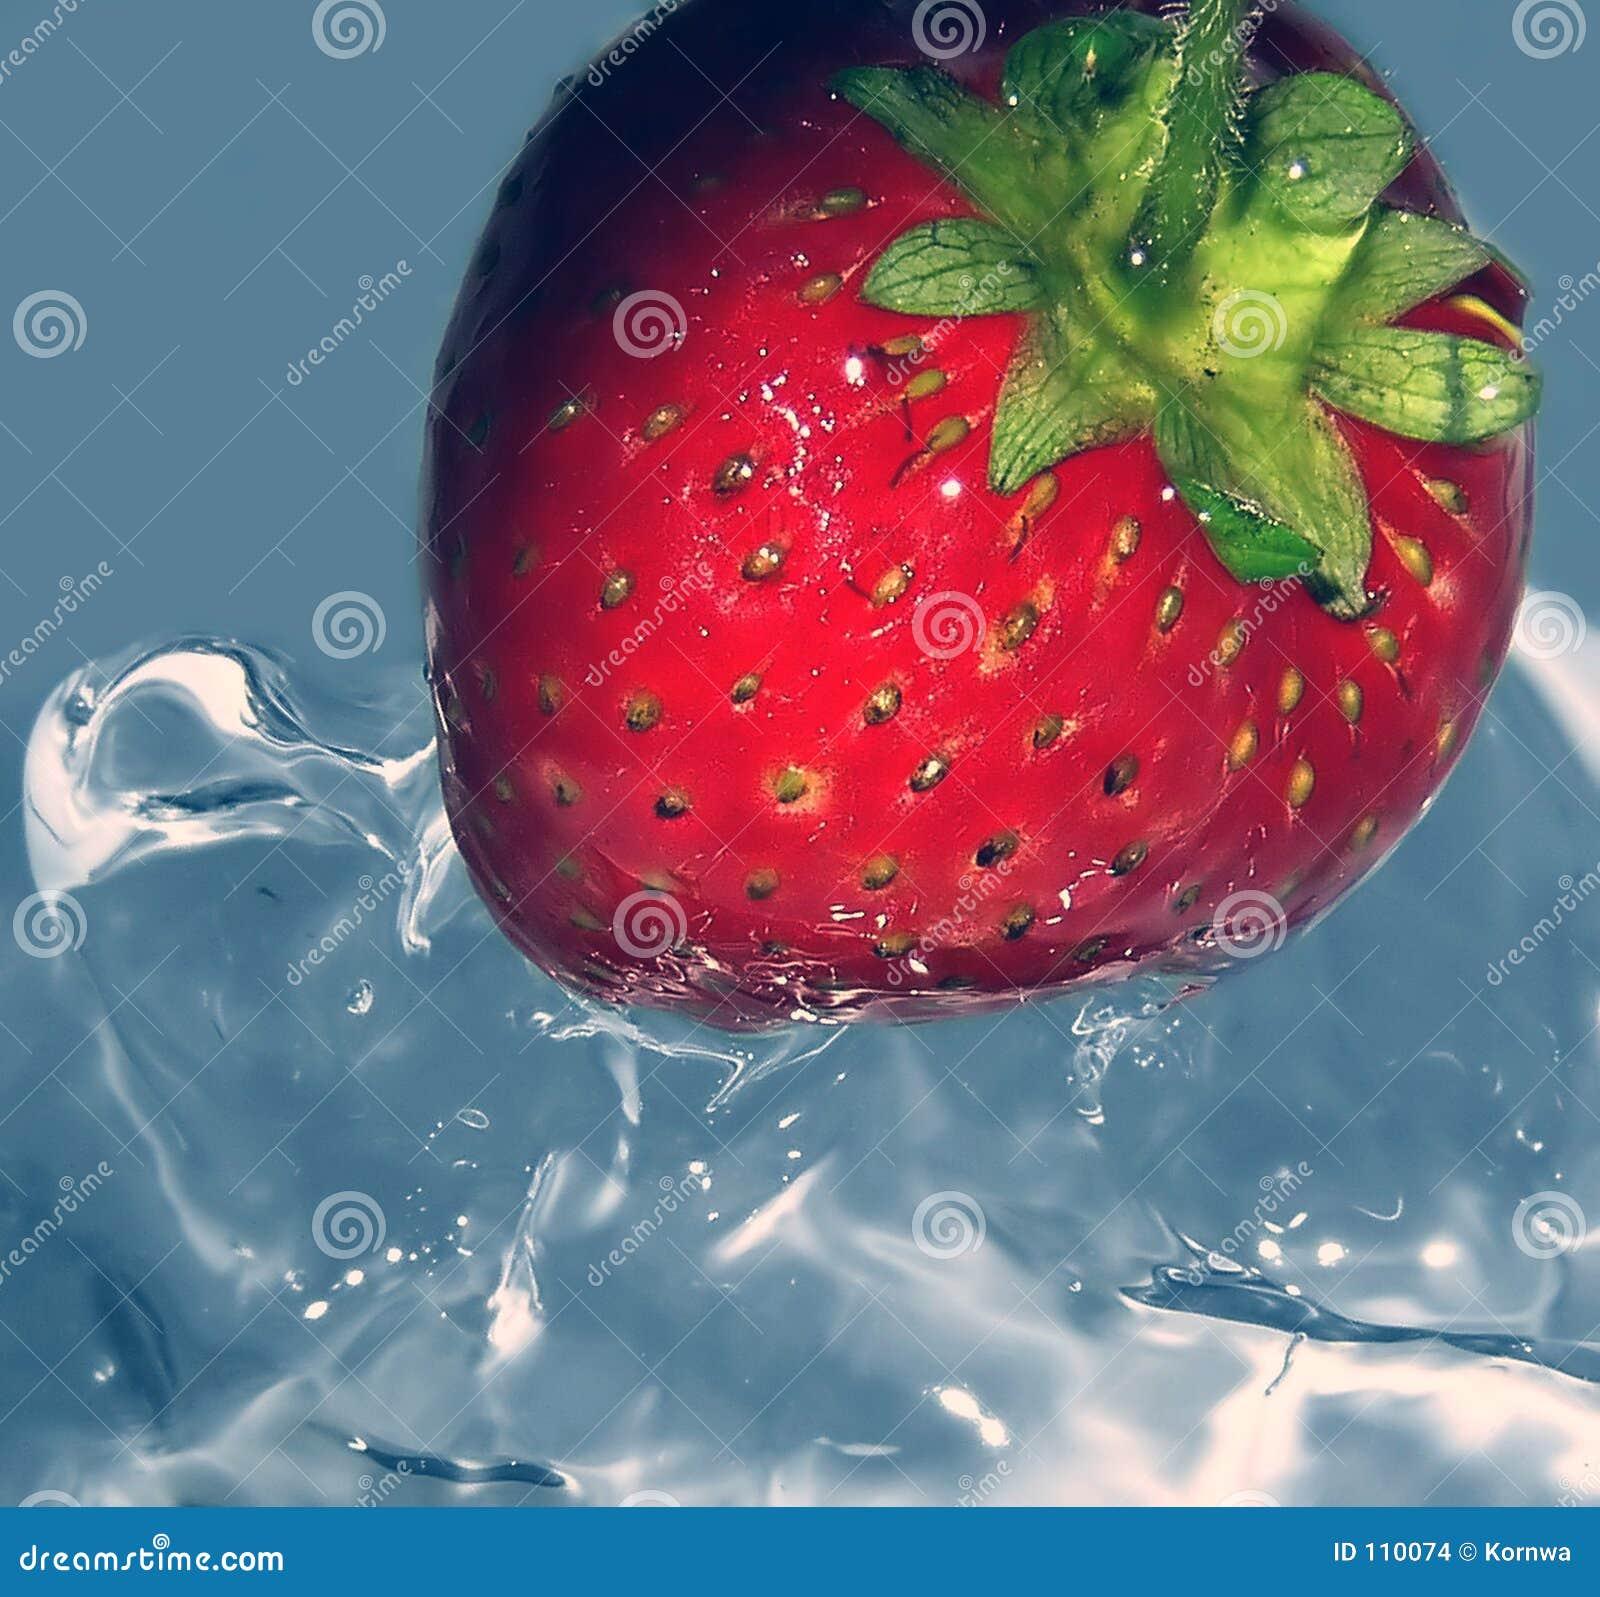 Fresh icy strawberry